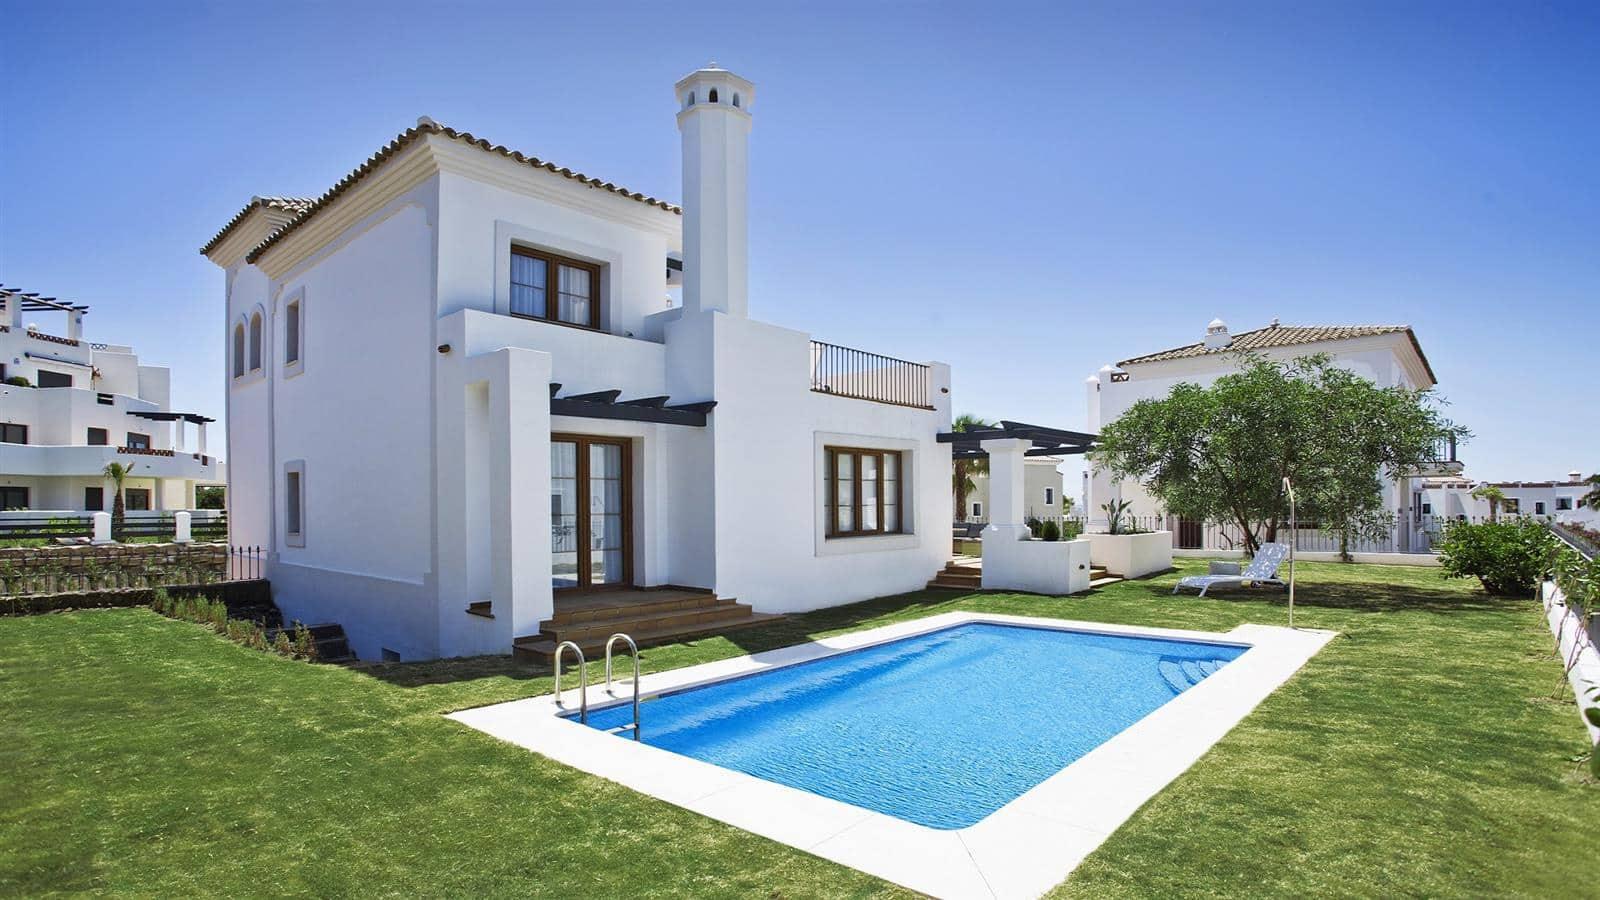 3 bedroom Villa for sale in Marbella with pool garage - € 560,000 (Ref: 5083725)